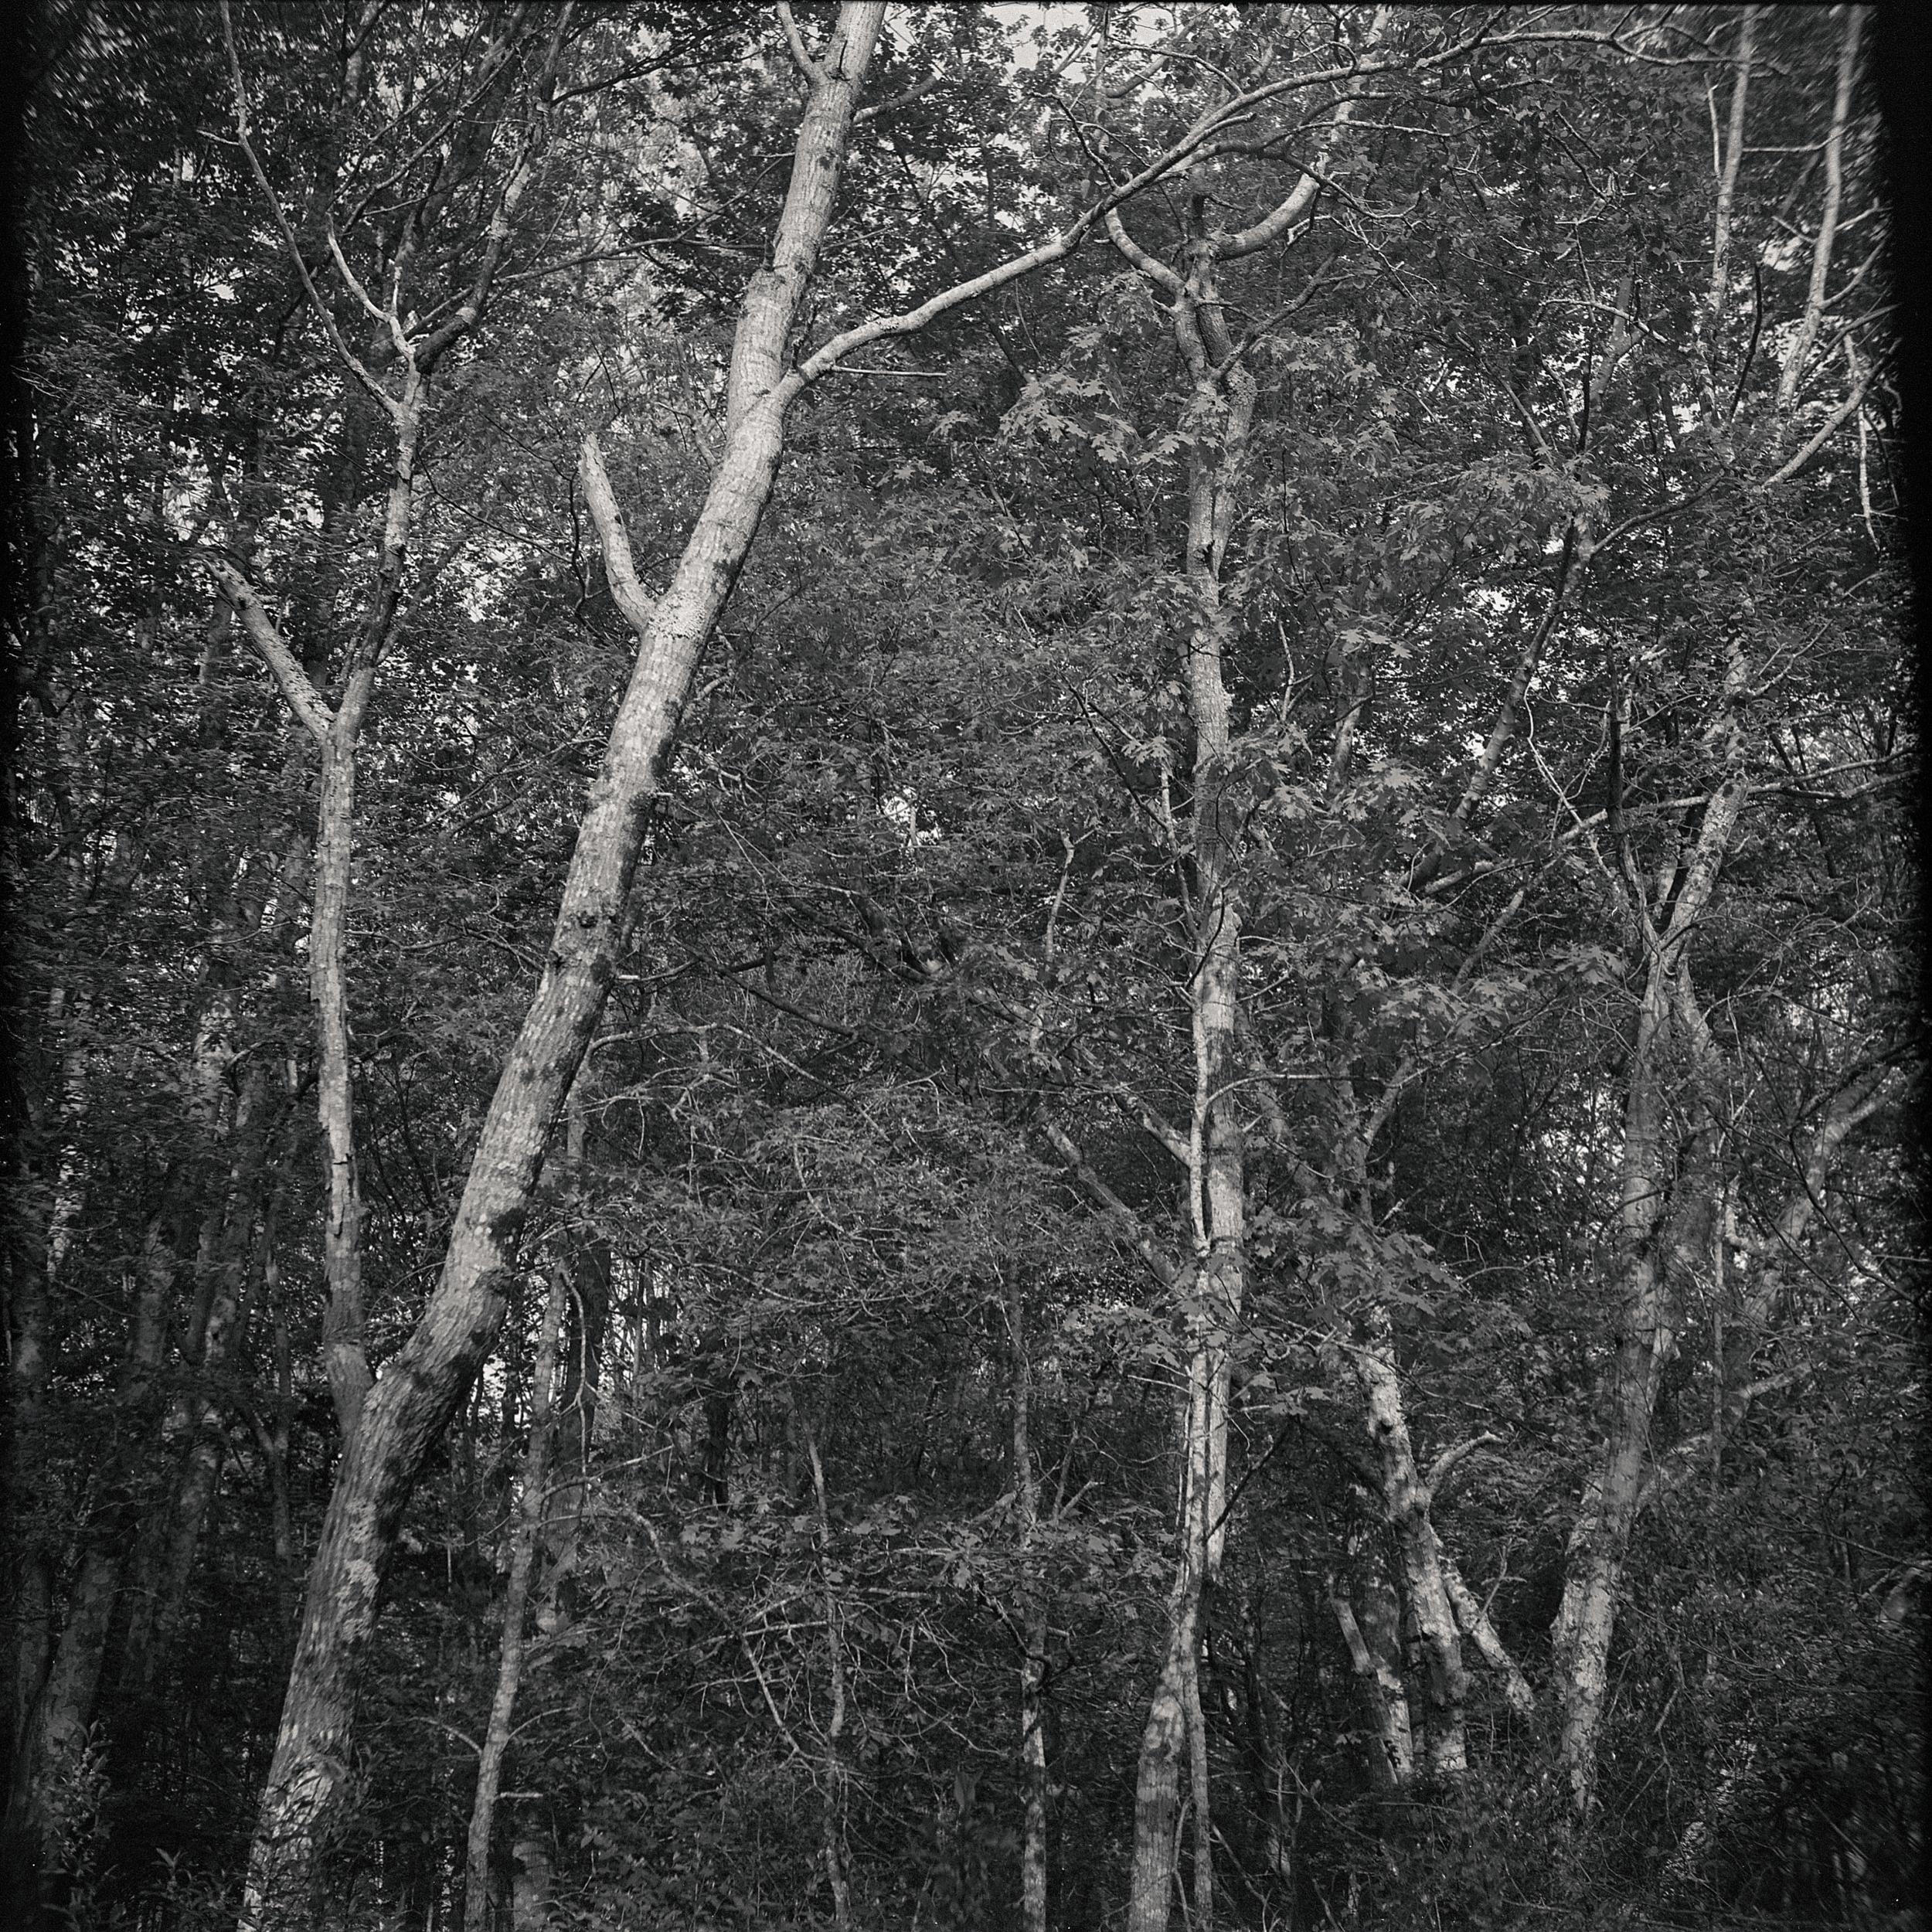 TreesJune001.jpg